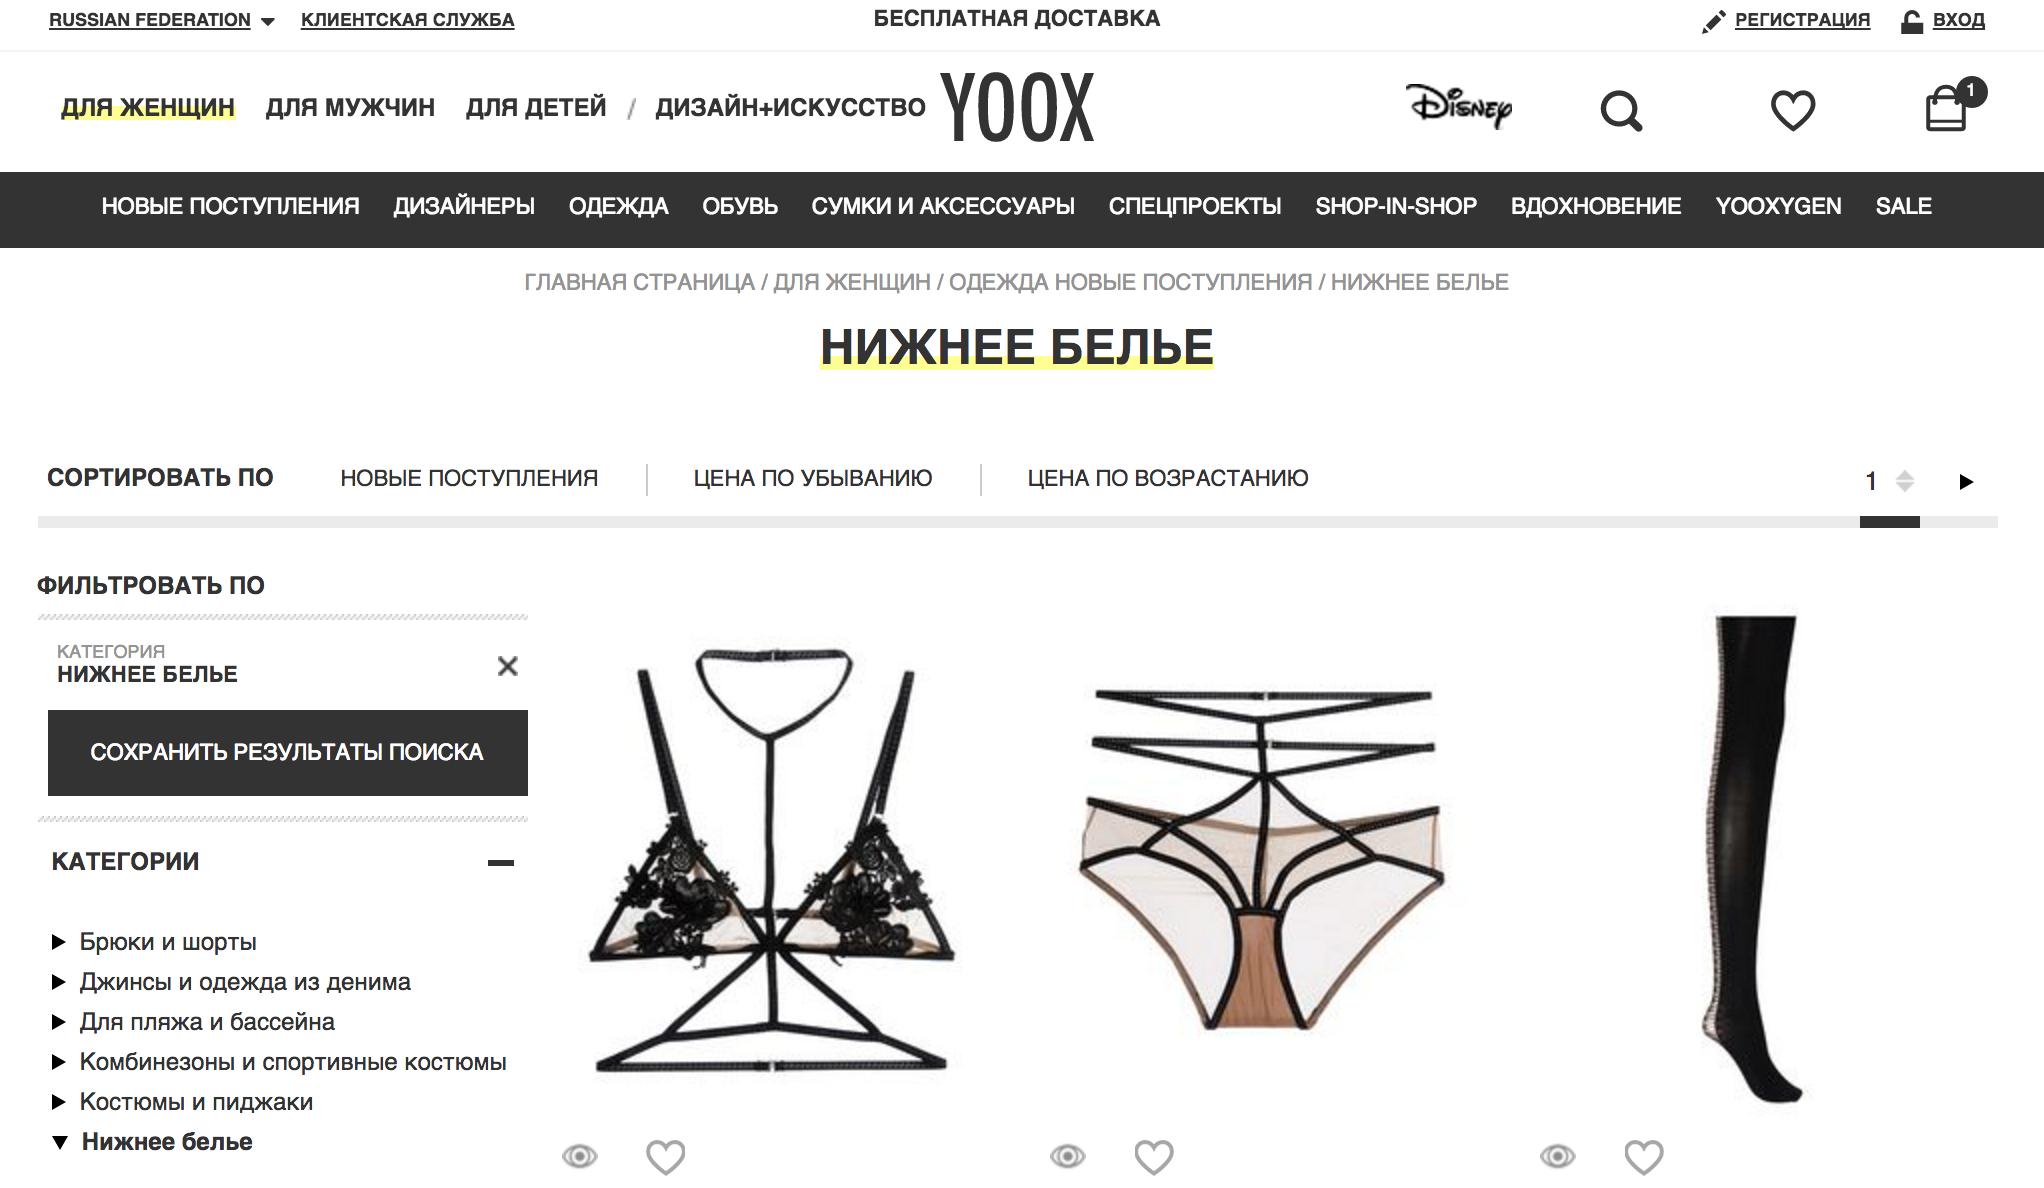 YOOX: Обзор онлайн-площадки с интересными фэшн-брендами и нижним бельём